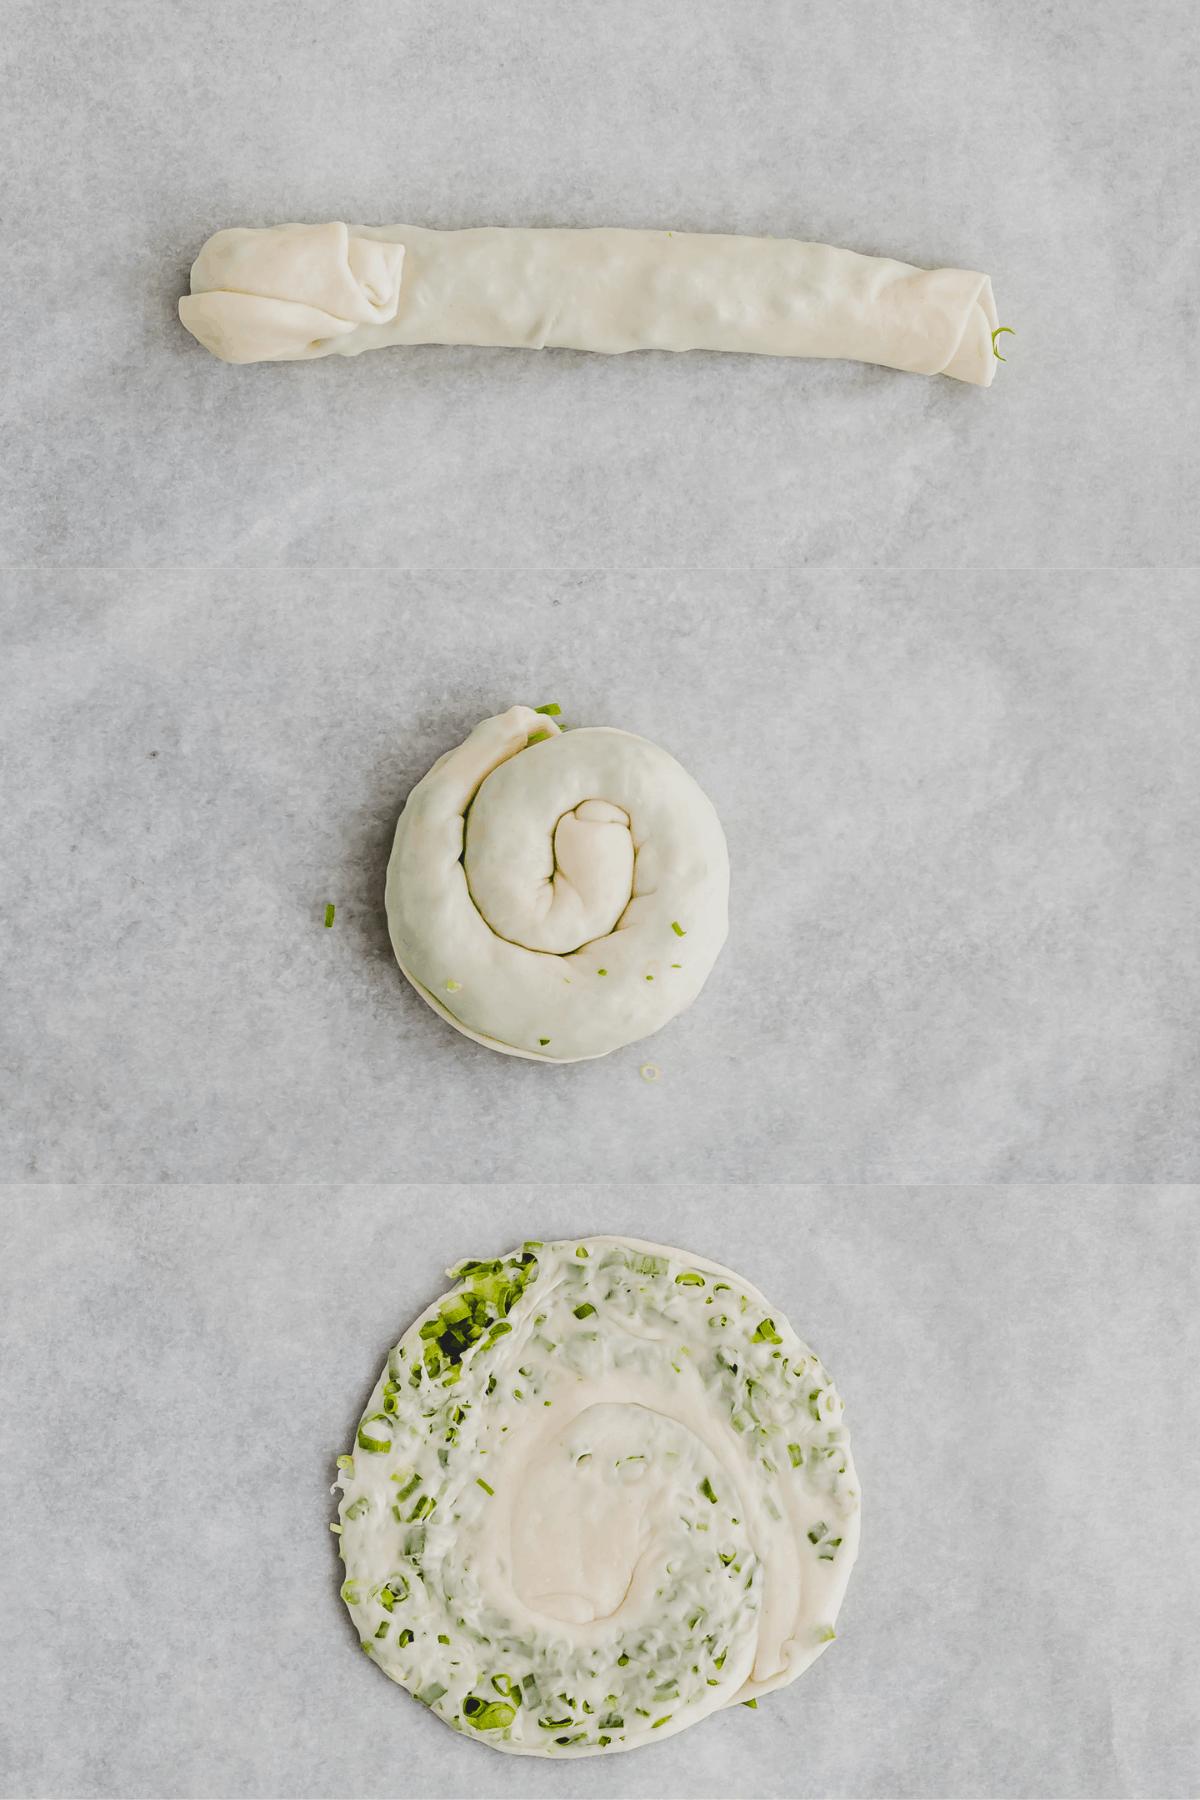 Scallion Pancakes Recipe Step 10-12